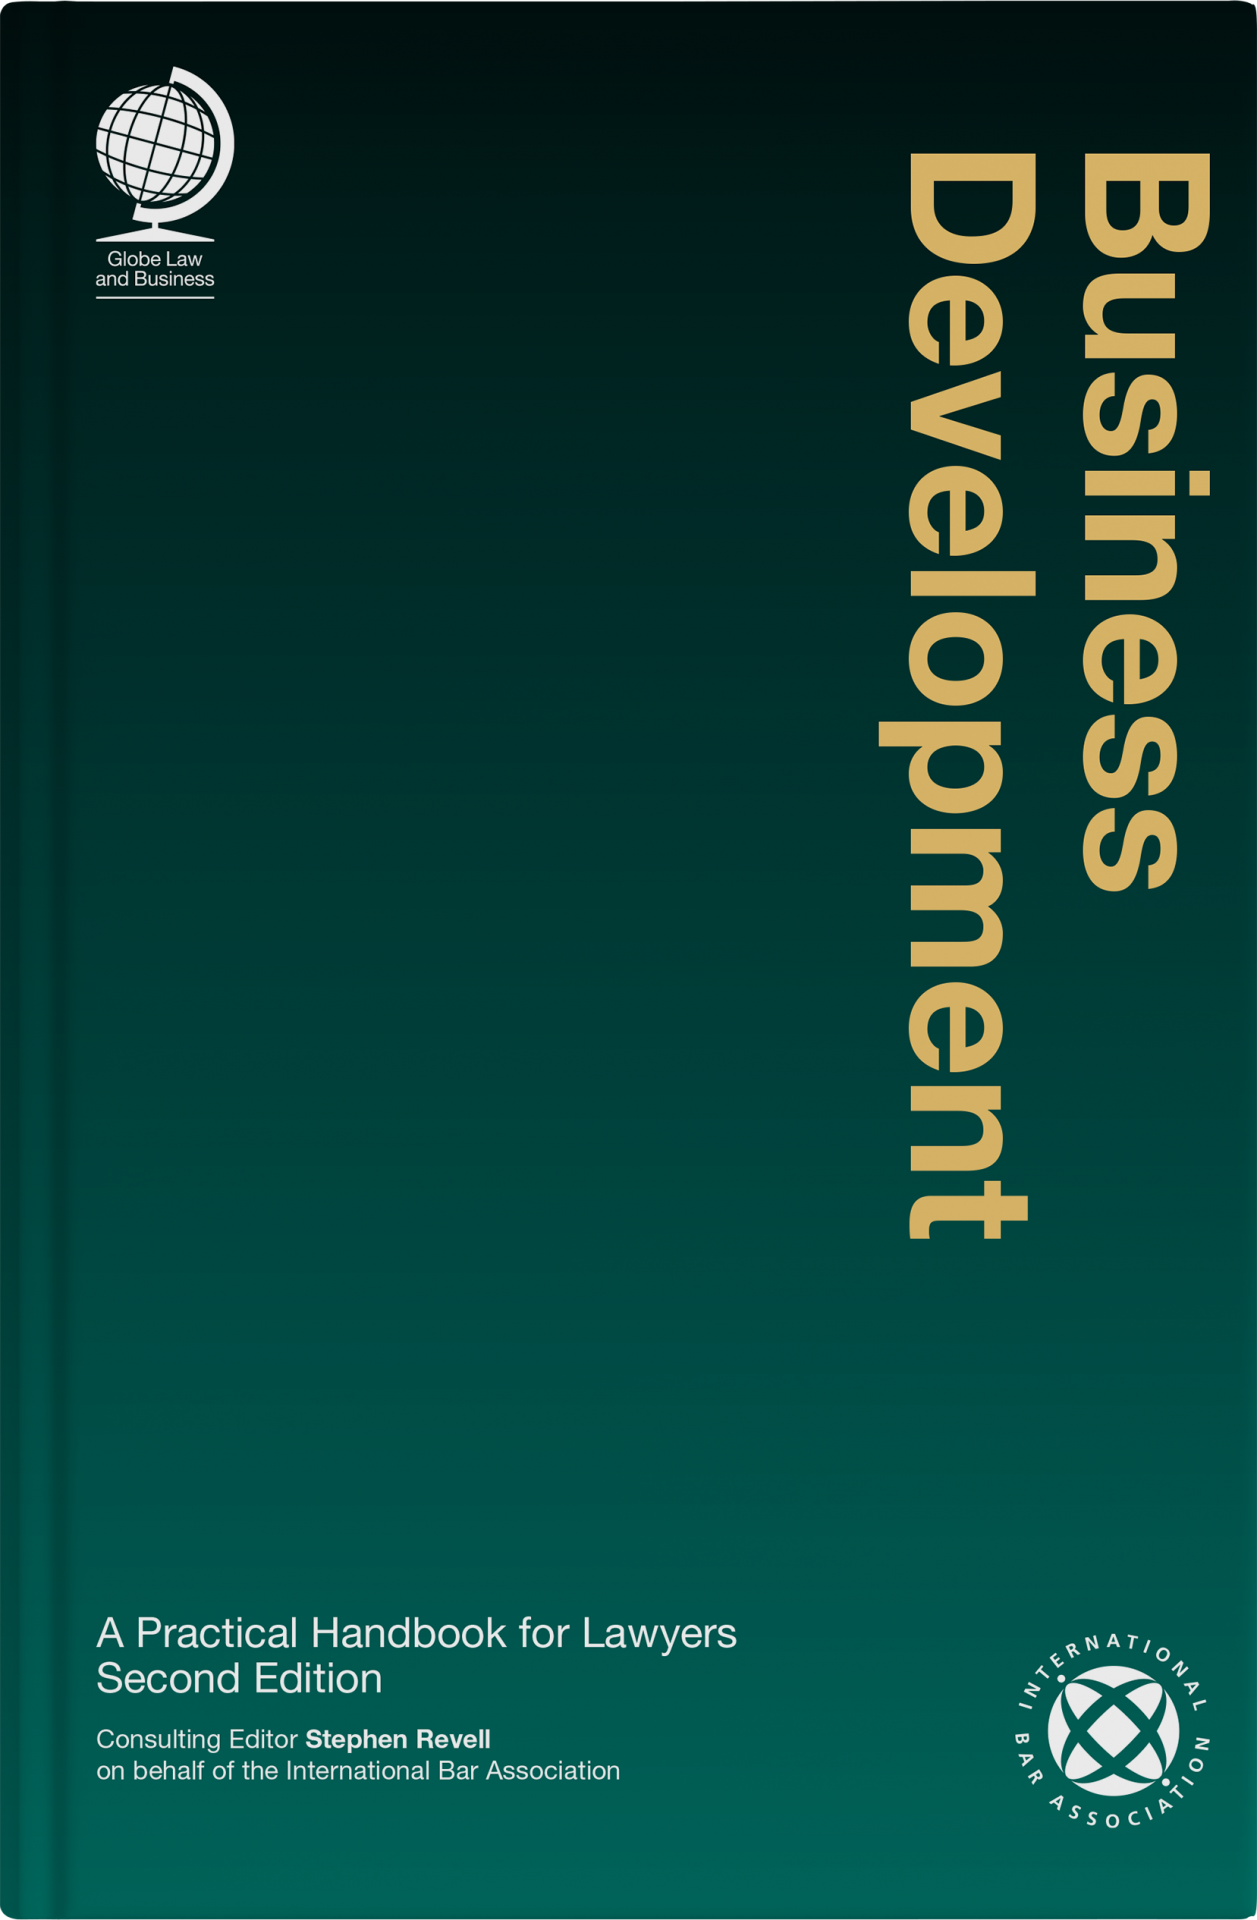 Business Development hardcover book